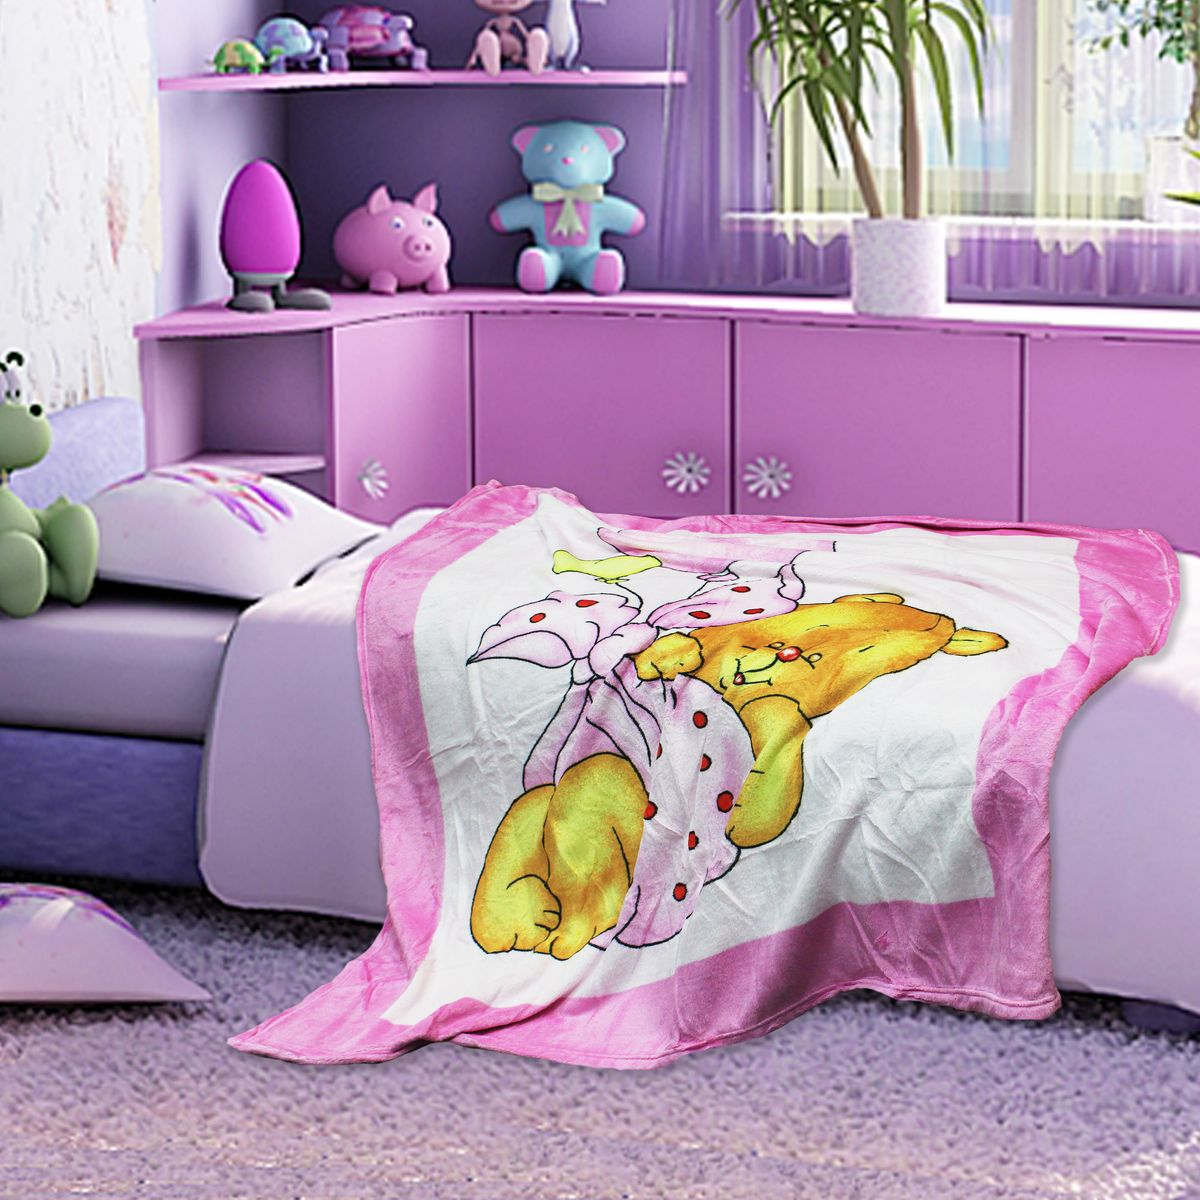 TexRepublic Плед Absolute Taw цвет розовый 127 х 152 см -  Детский текстиль